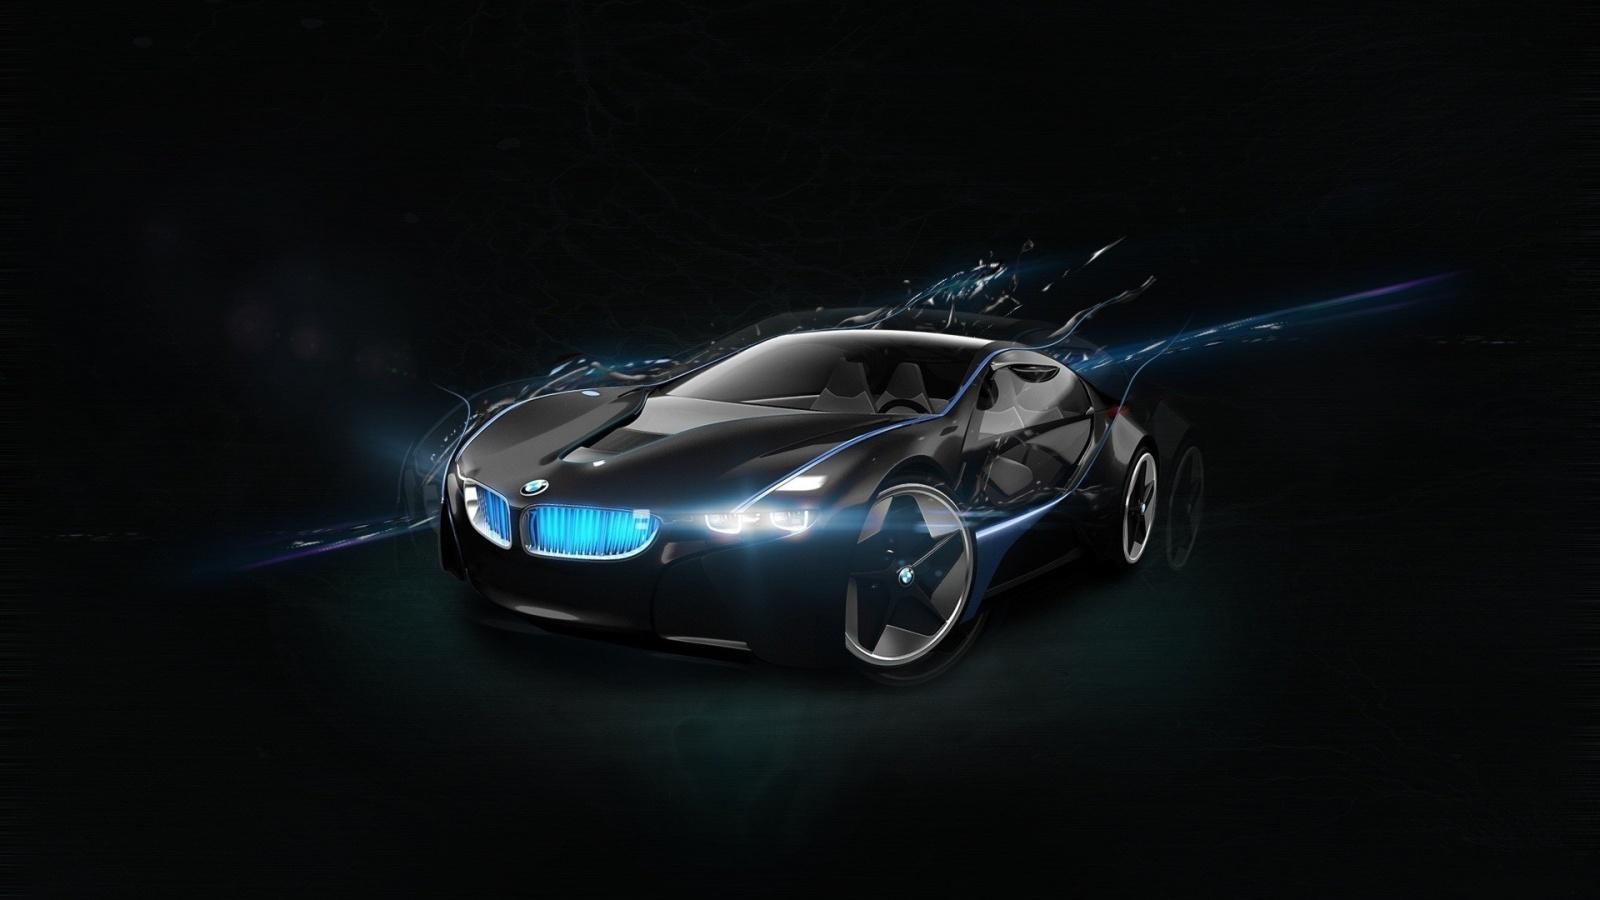 bmw car themes download